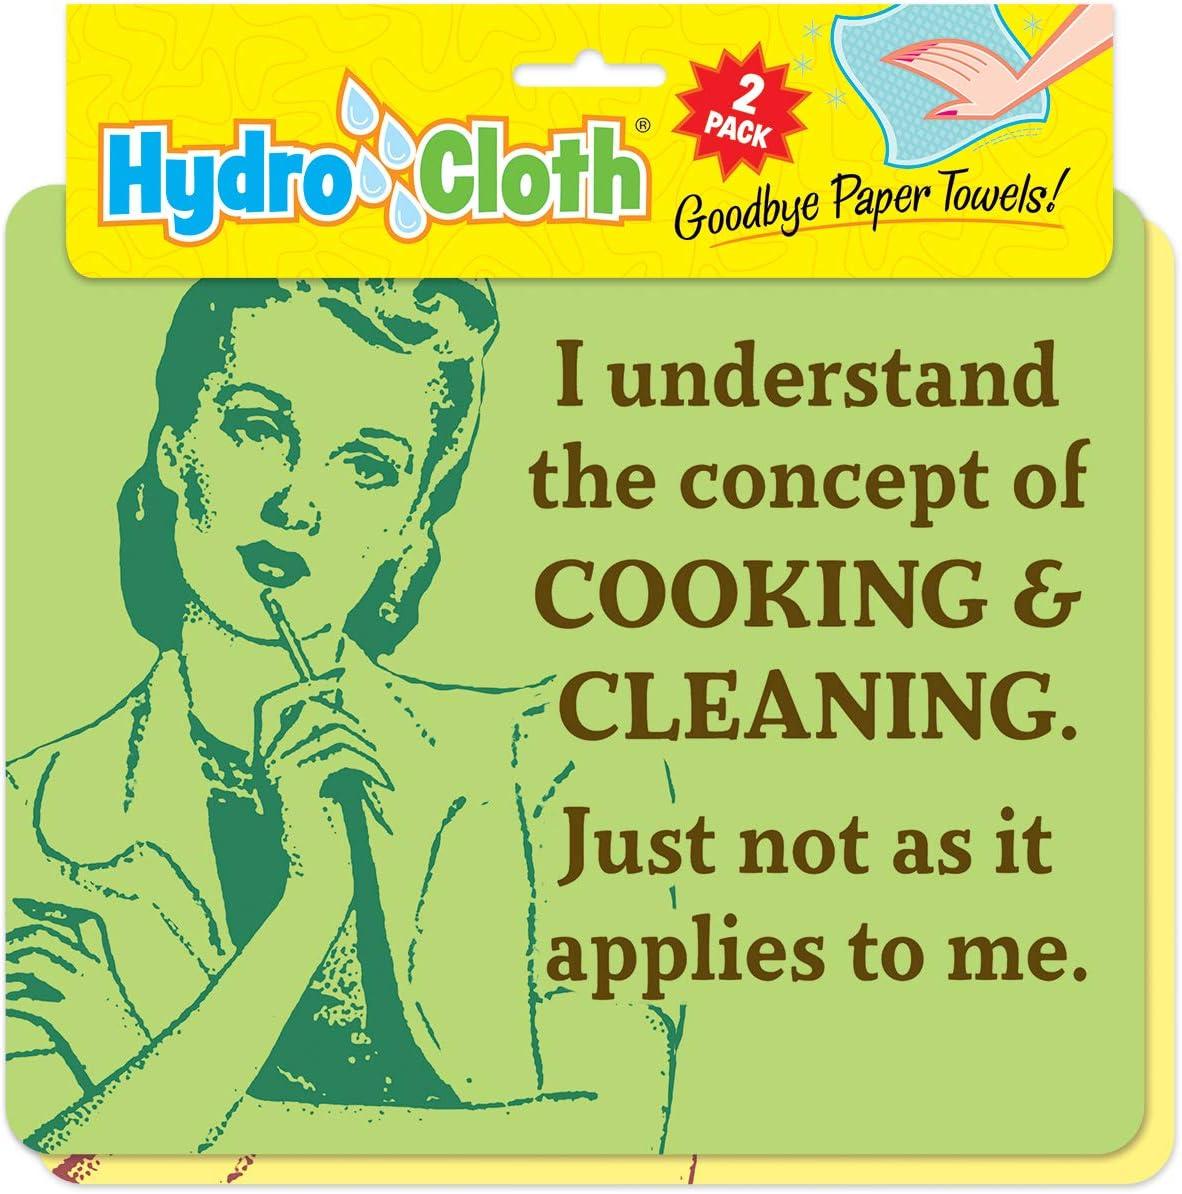 Amazon Com I Understand Hydro Cloths Eco Friendly Sponge Cloths Reusable Swedish Dish Cloths Set Of 2 Printed Sponge Cloths Kitchen Bath Auto Replaces 30 Rolls Of Paper Towels